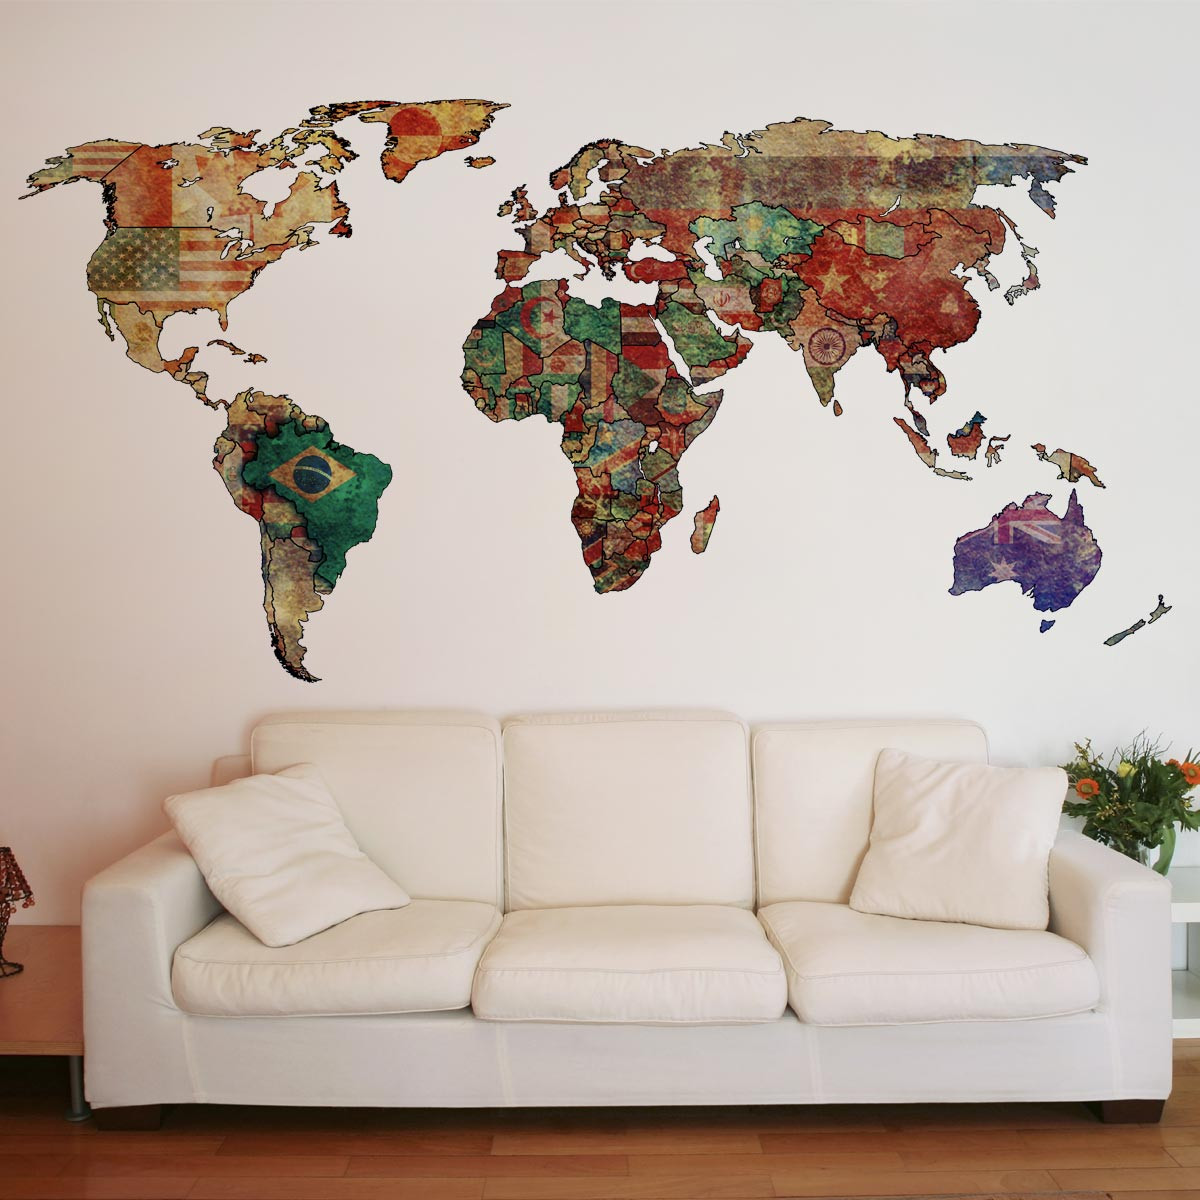 comprar mapa mundi para parede Adesivos de Parede   Papel de Parede Adesivo   Cole Decore comprar mapa mundi para parede